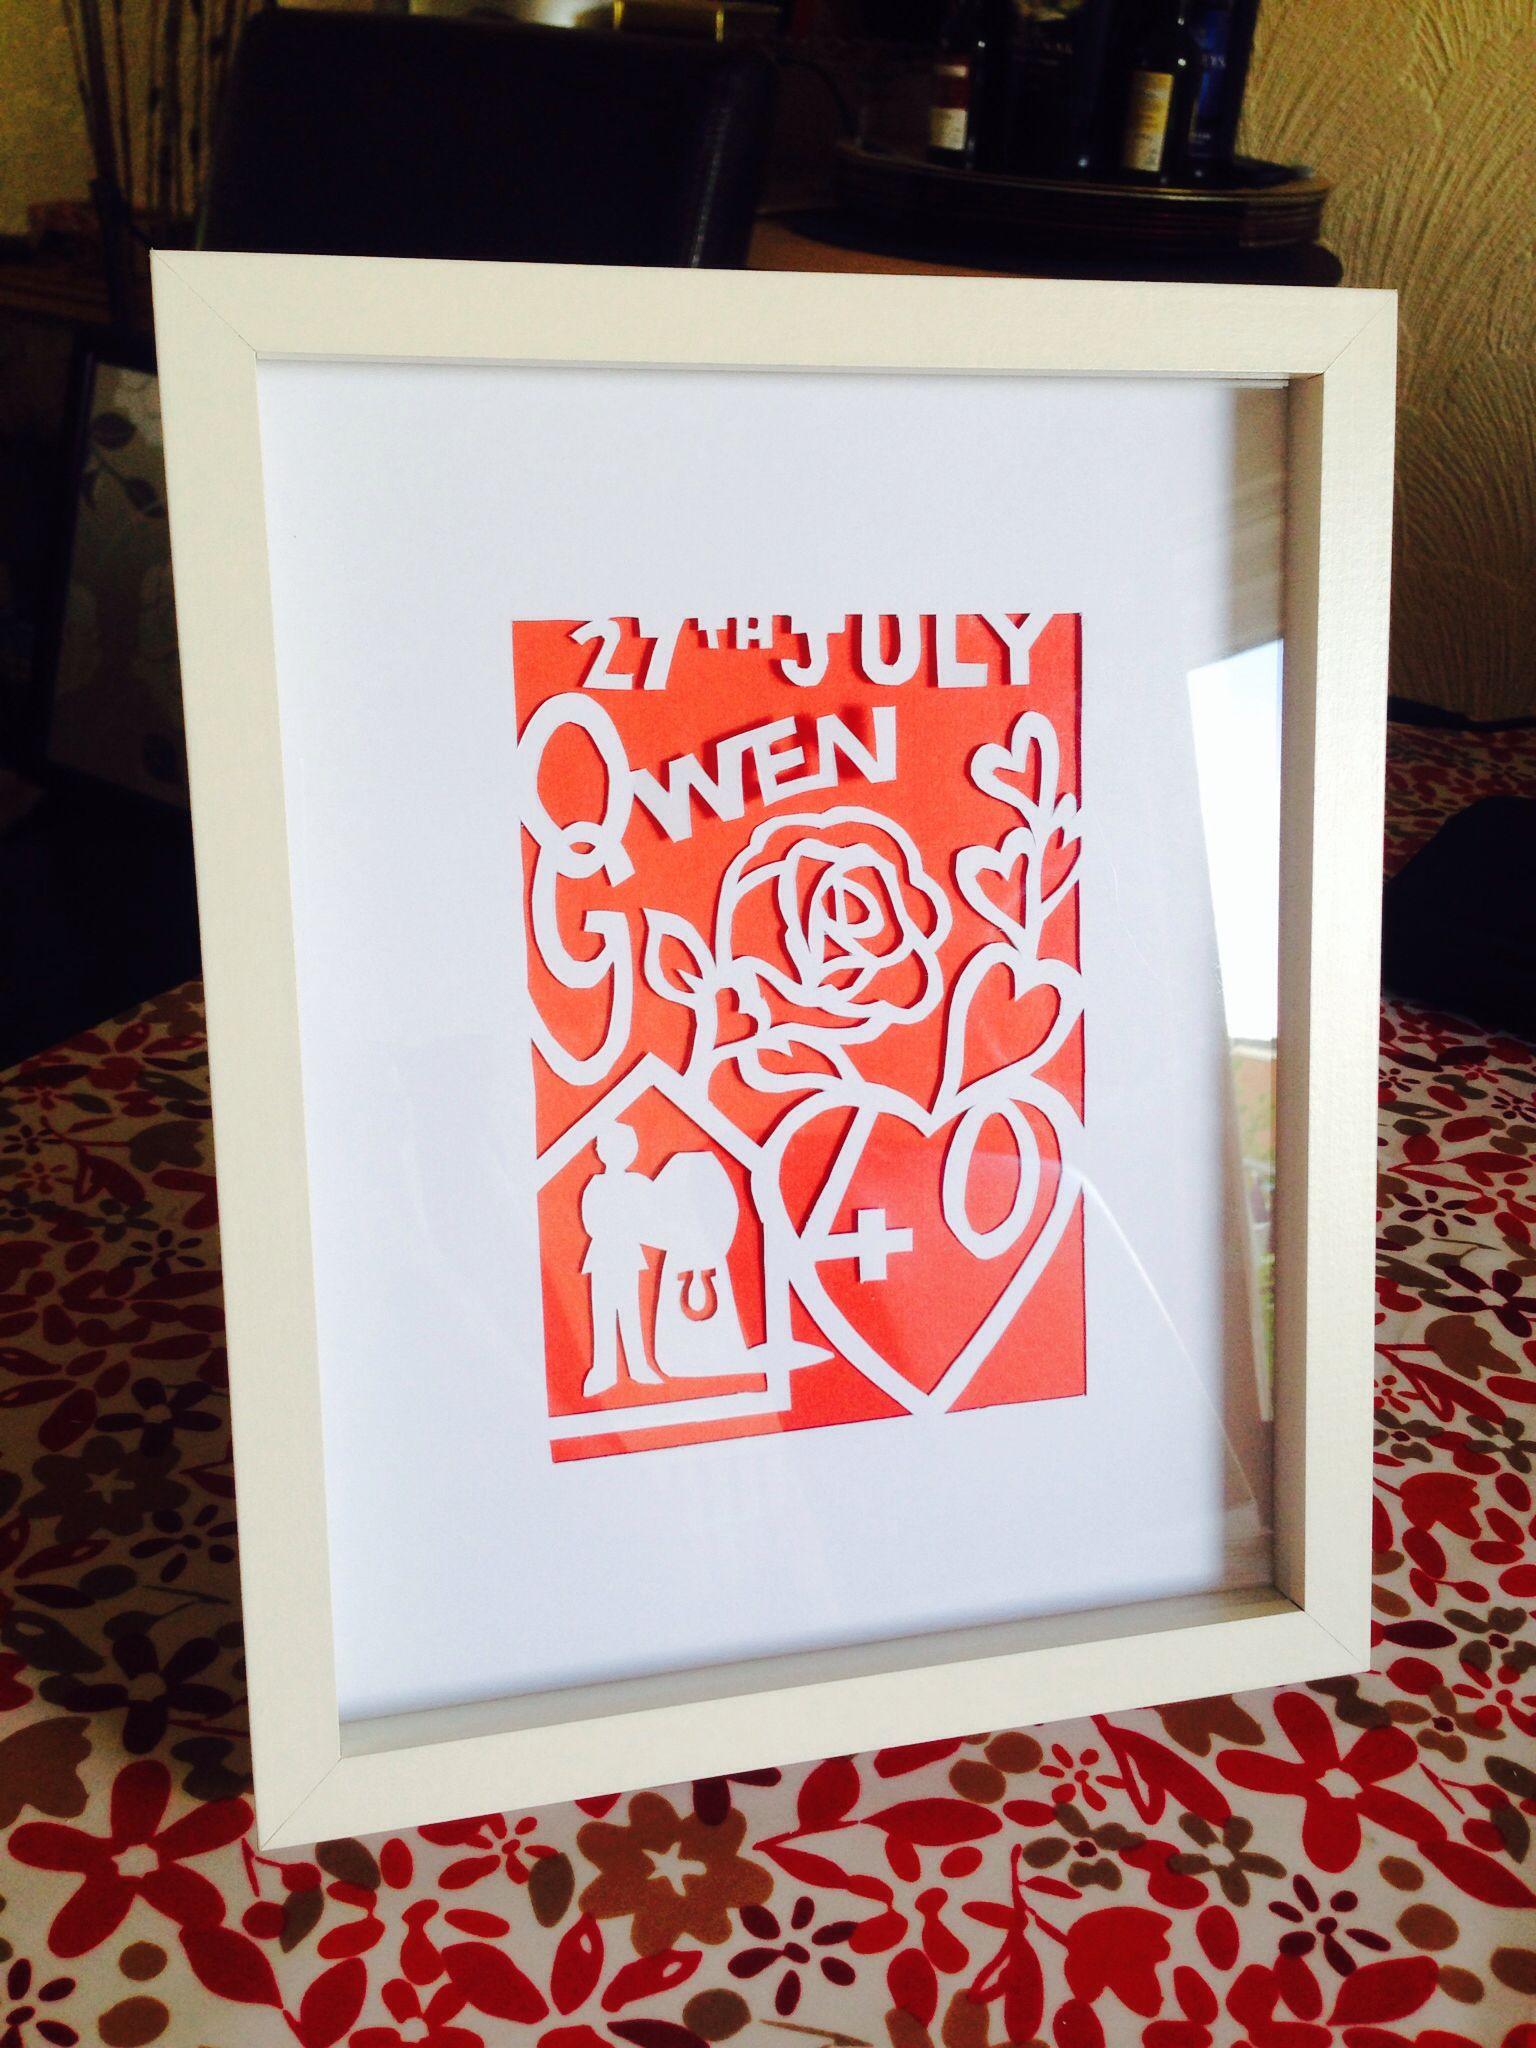 Homemade Ruby wedding anniversary gift for my